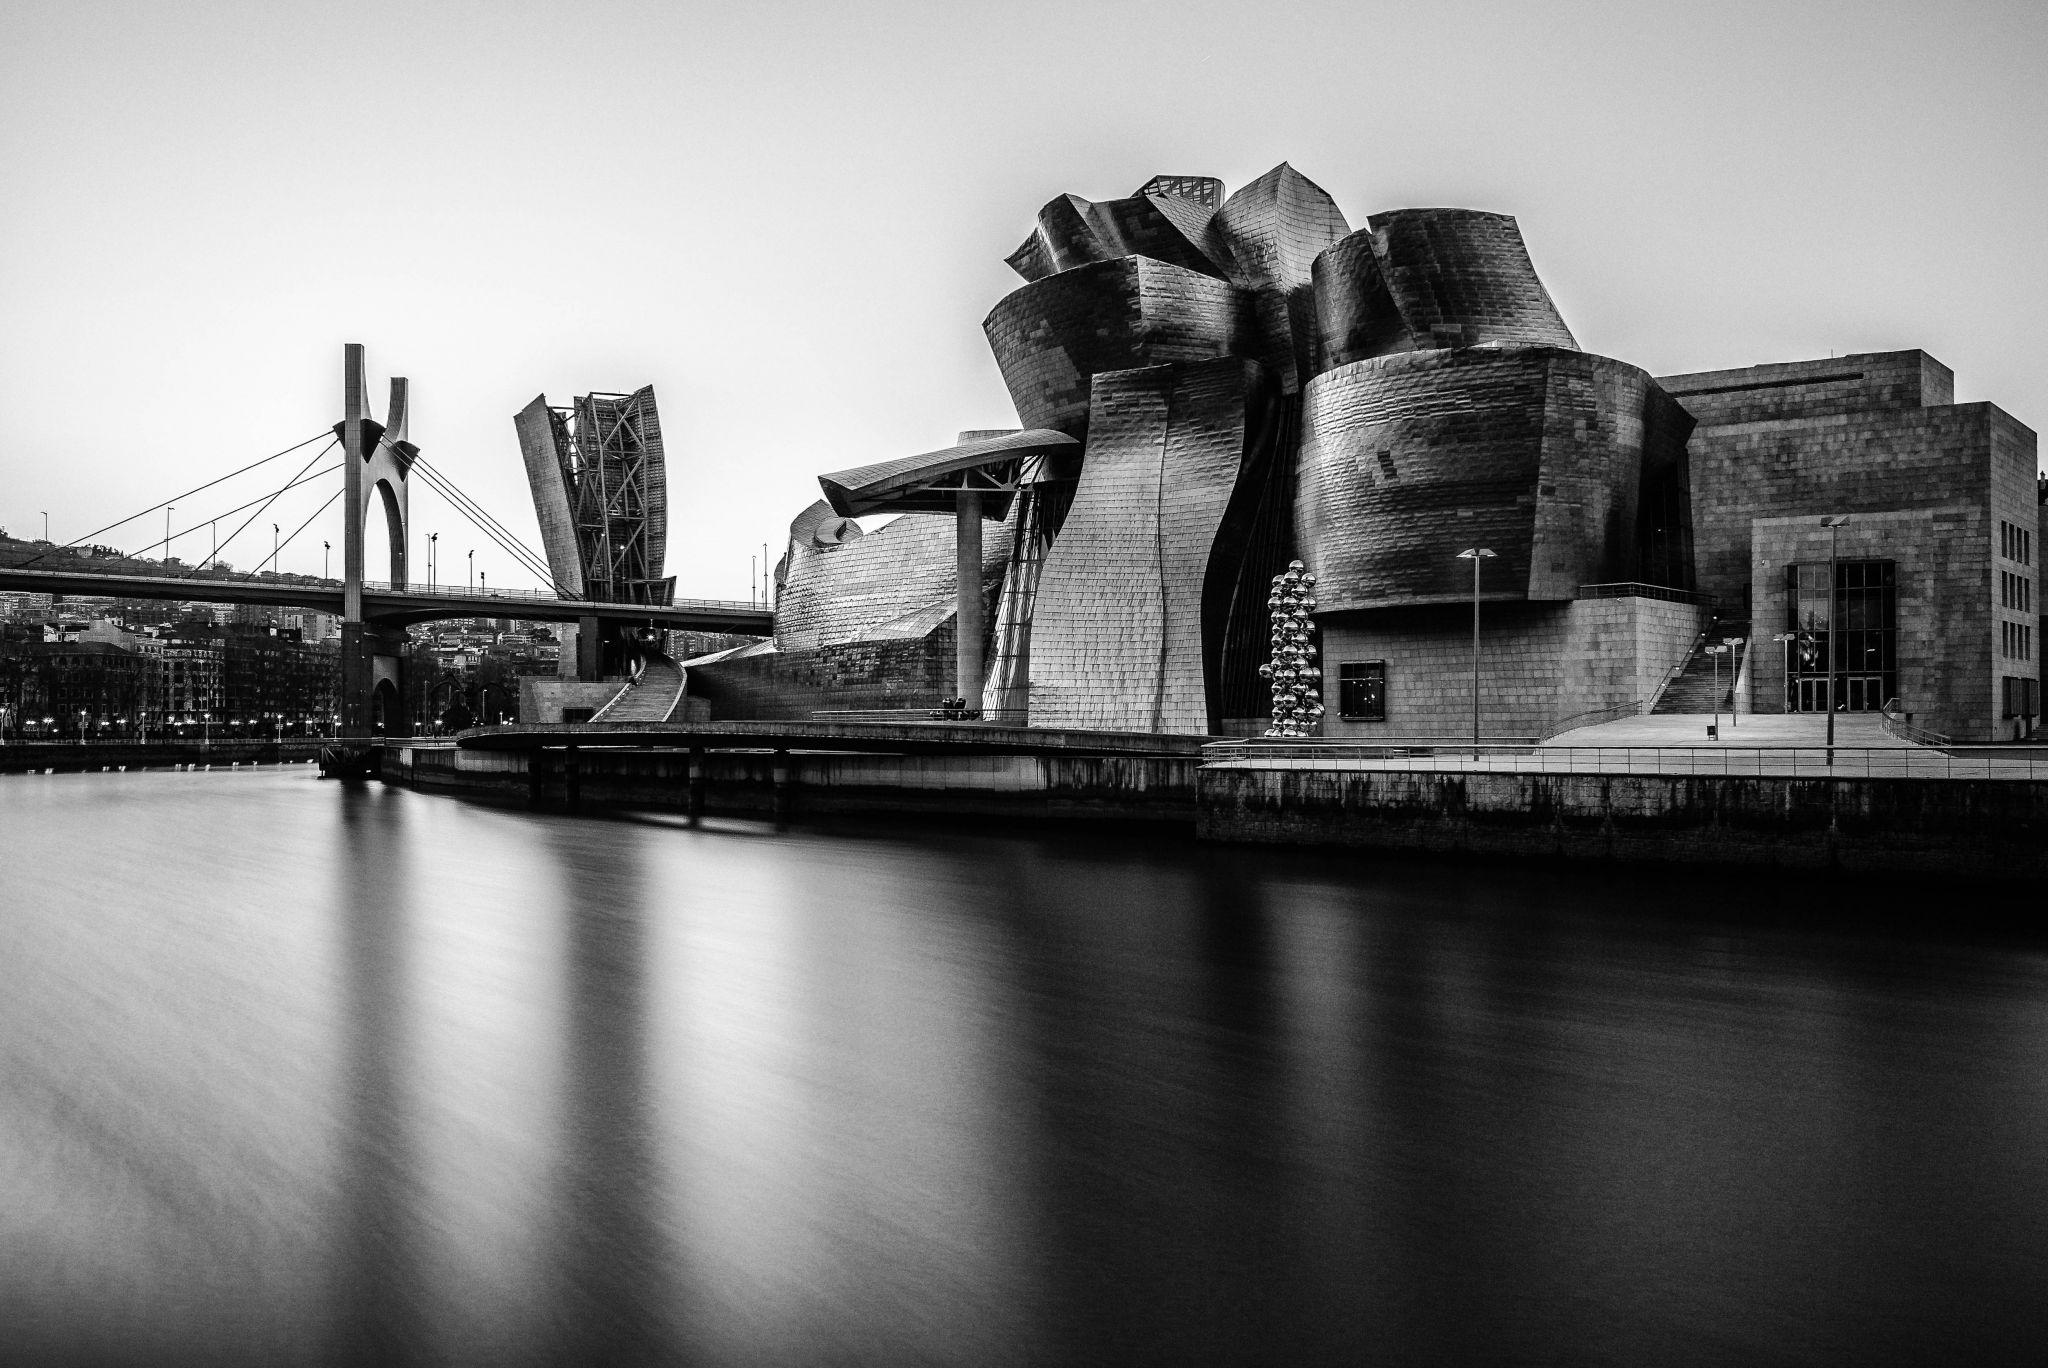 View of Guggenheim Museum, Spain